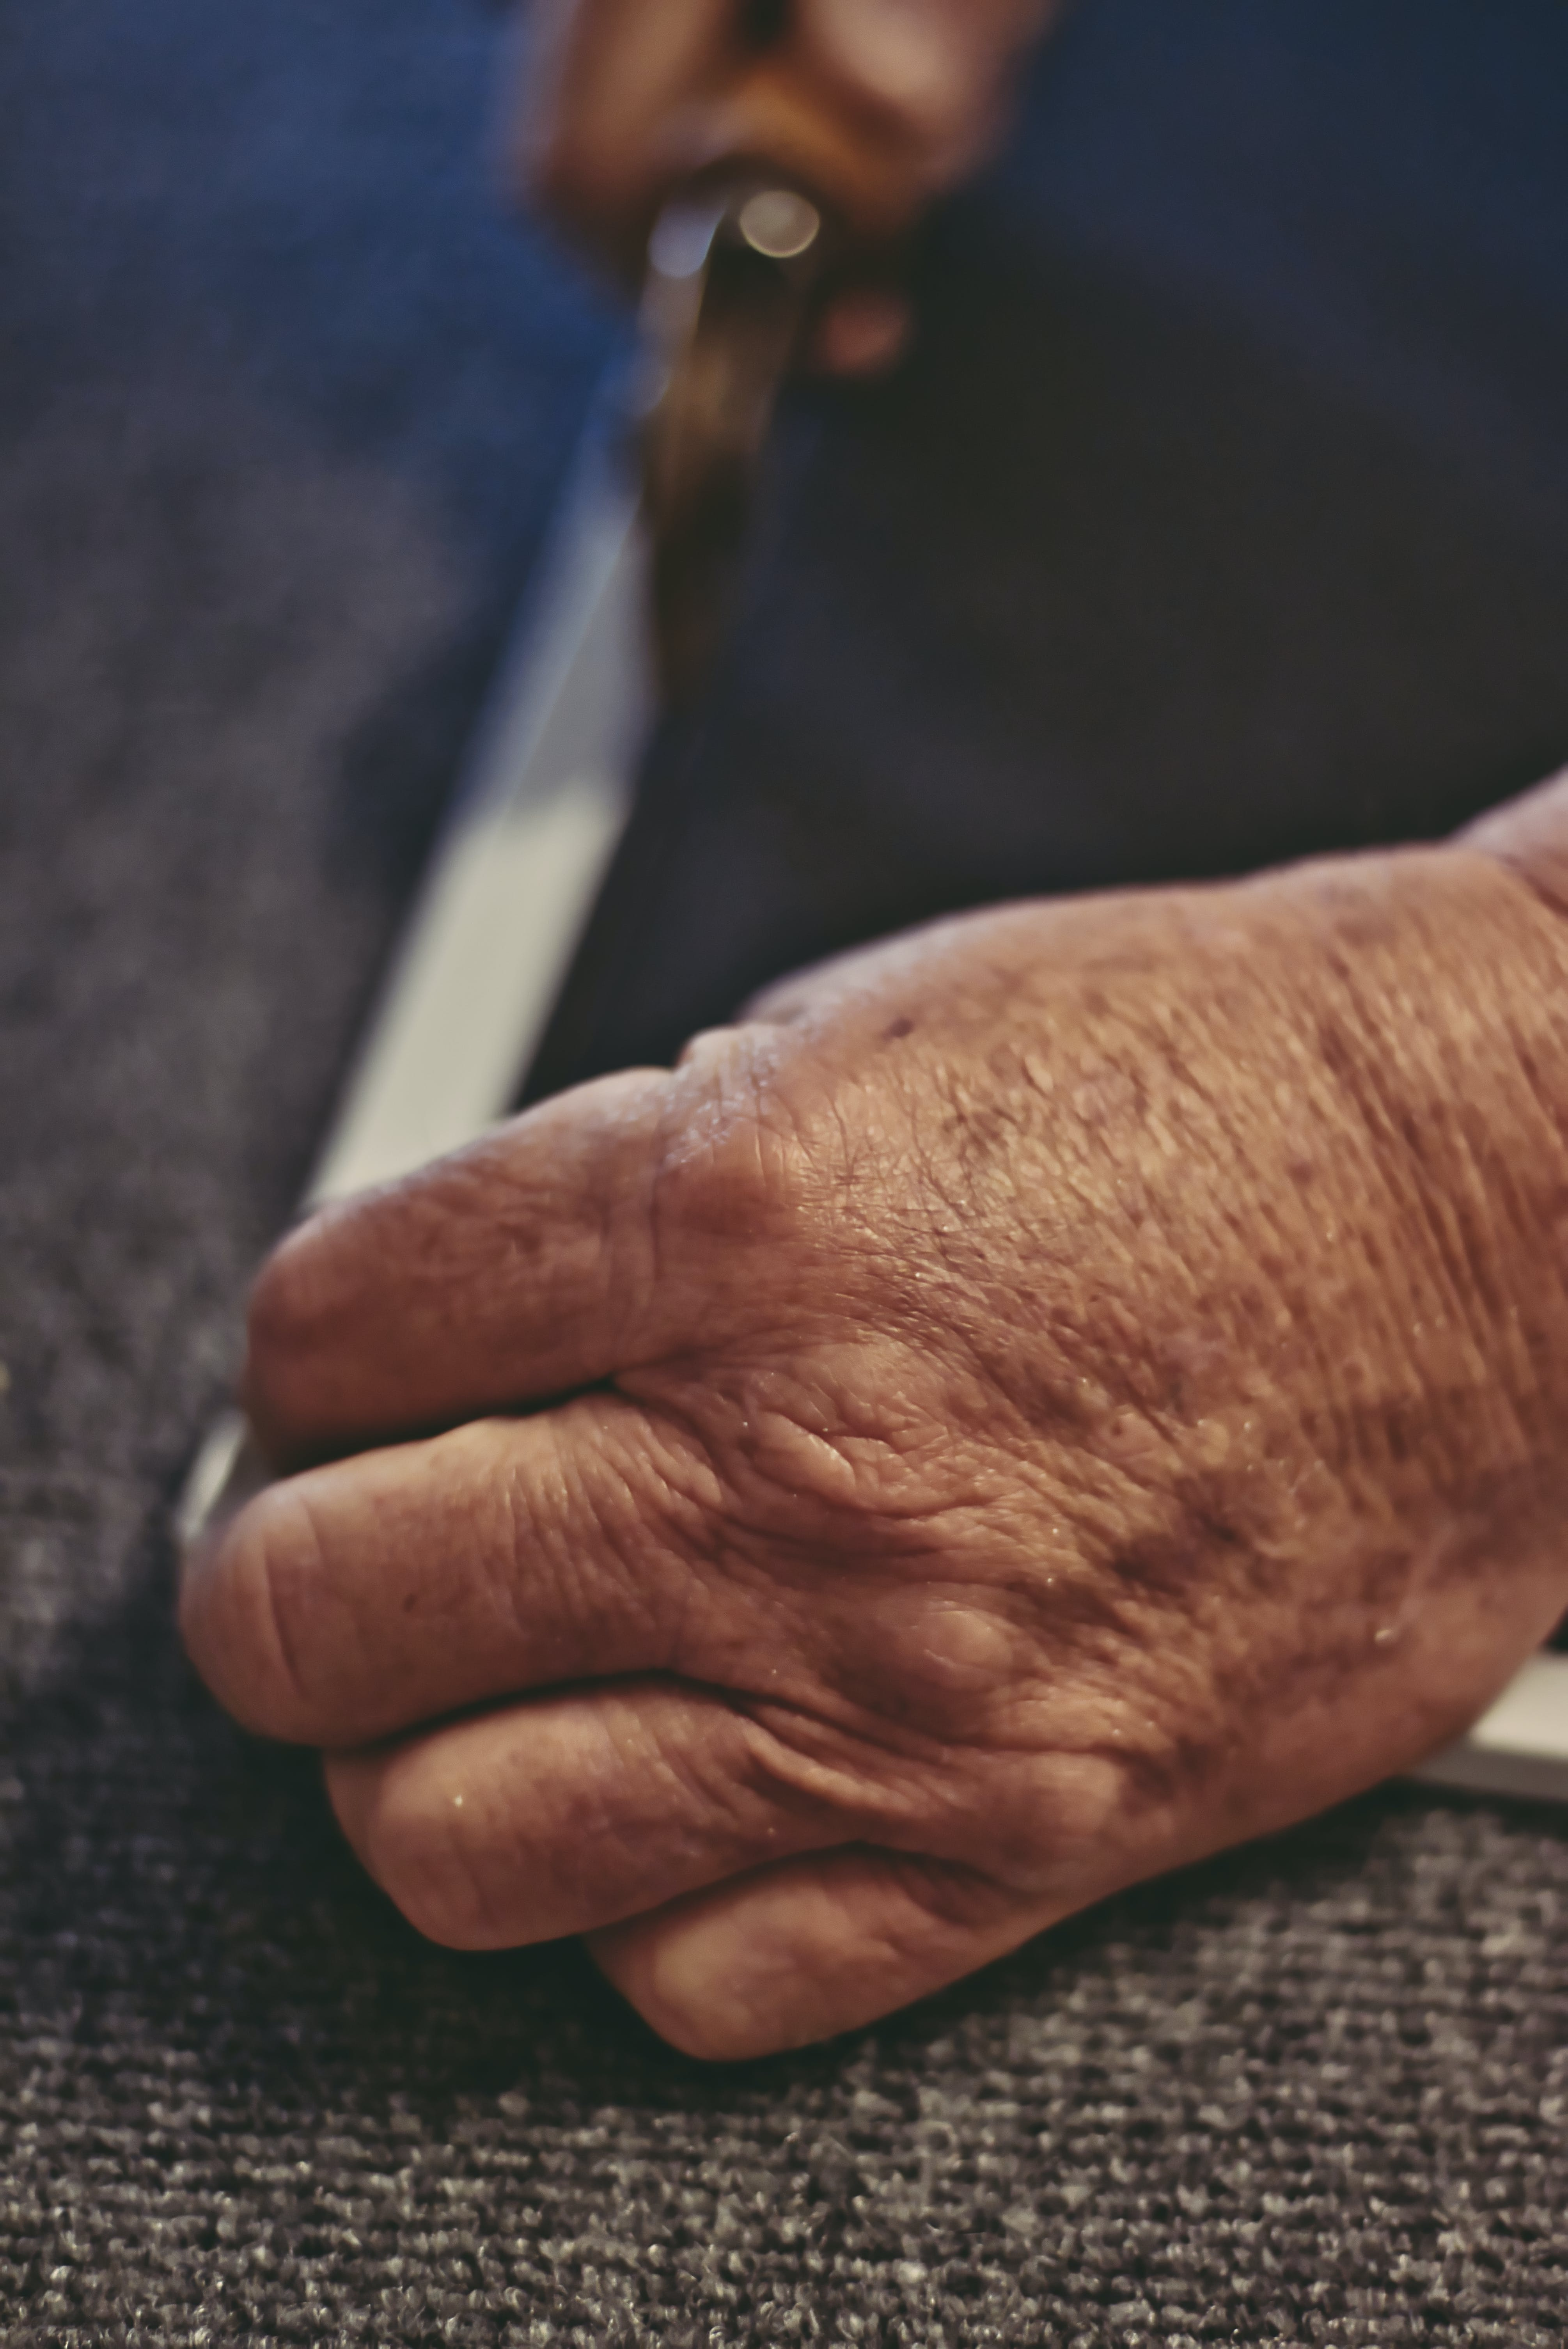 Free stock photo of hands, working hands